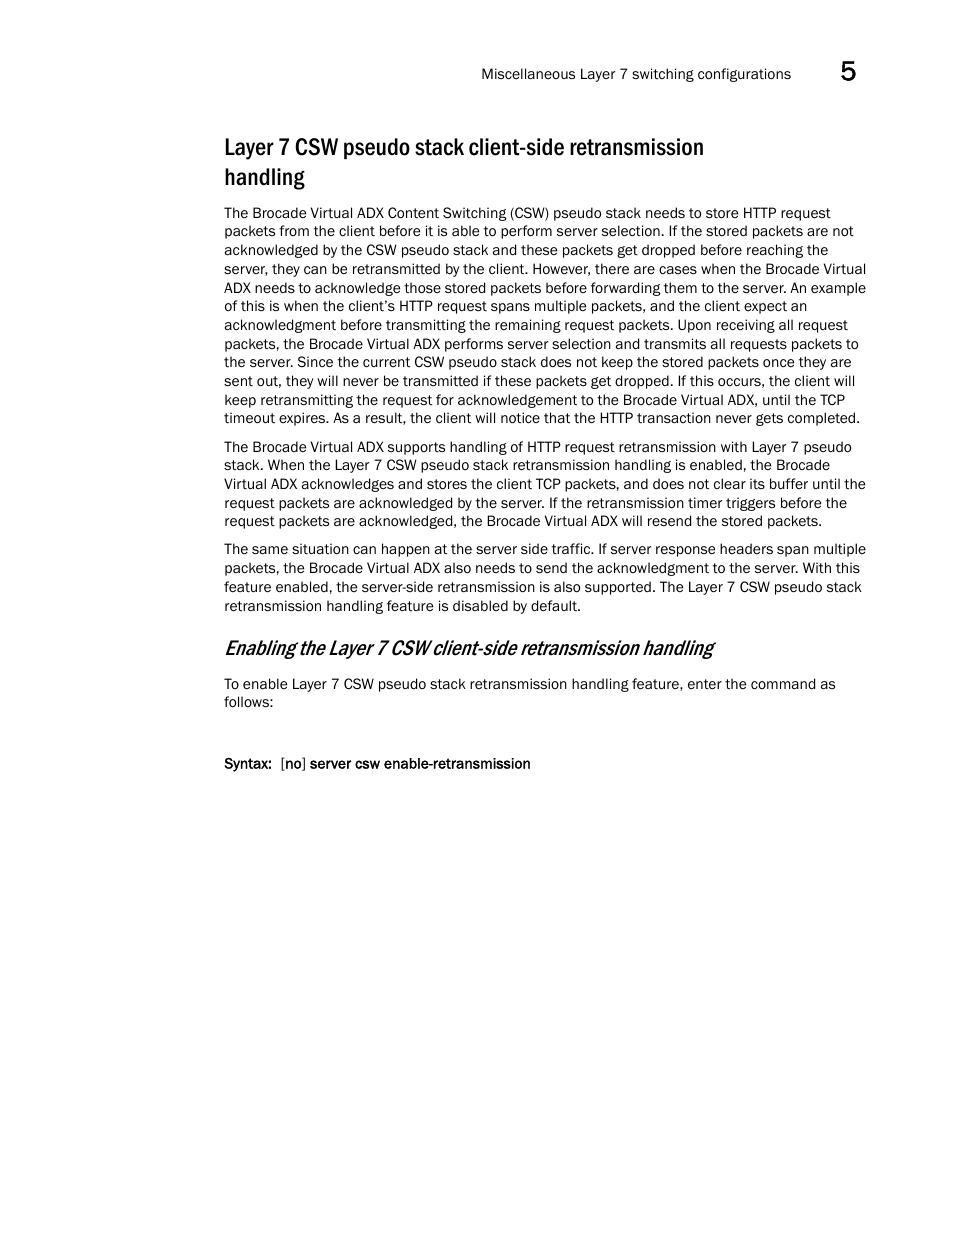 Brocade Virtual ADX Server Load Balancing Guide (Supporting ADX v03